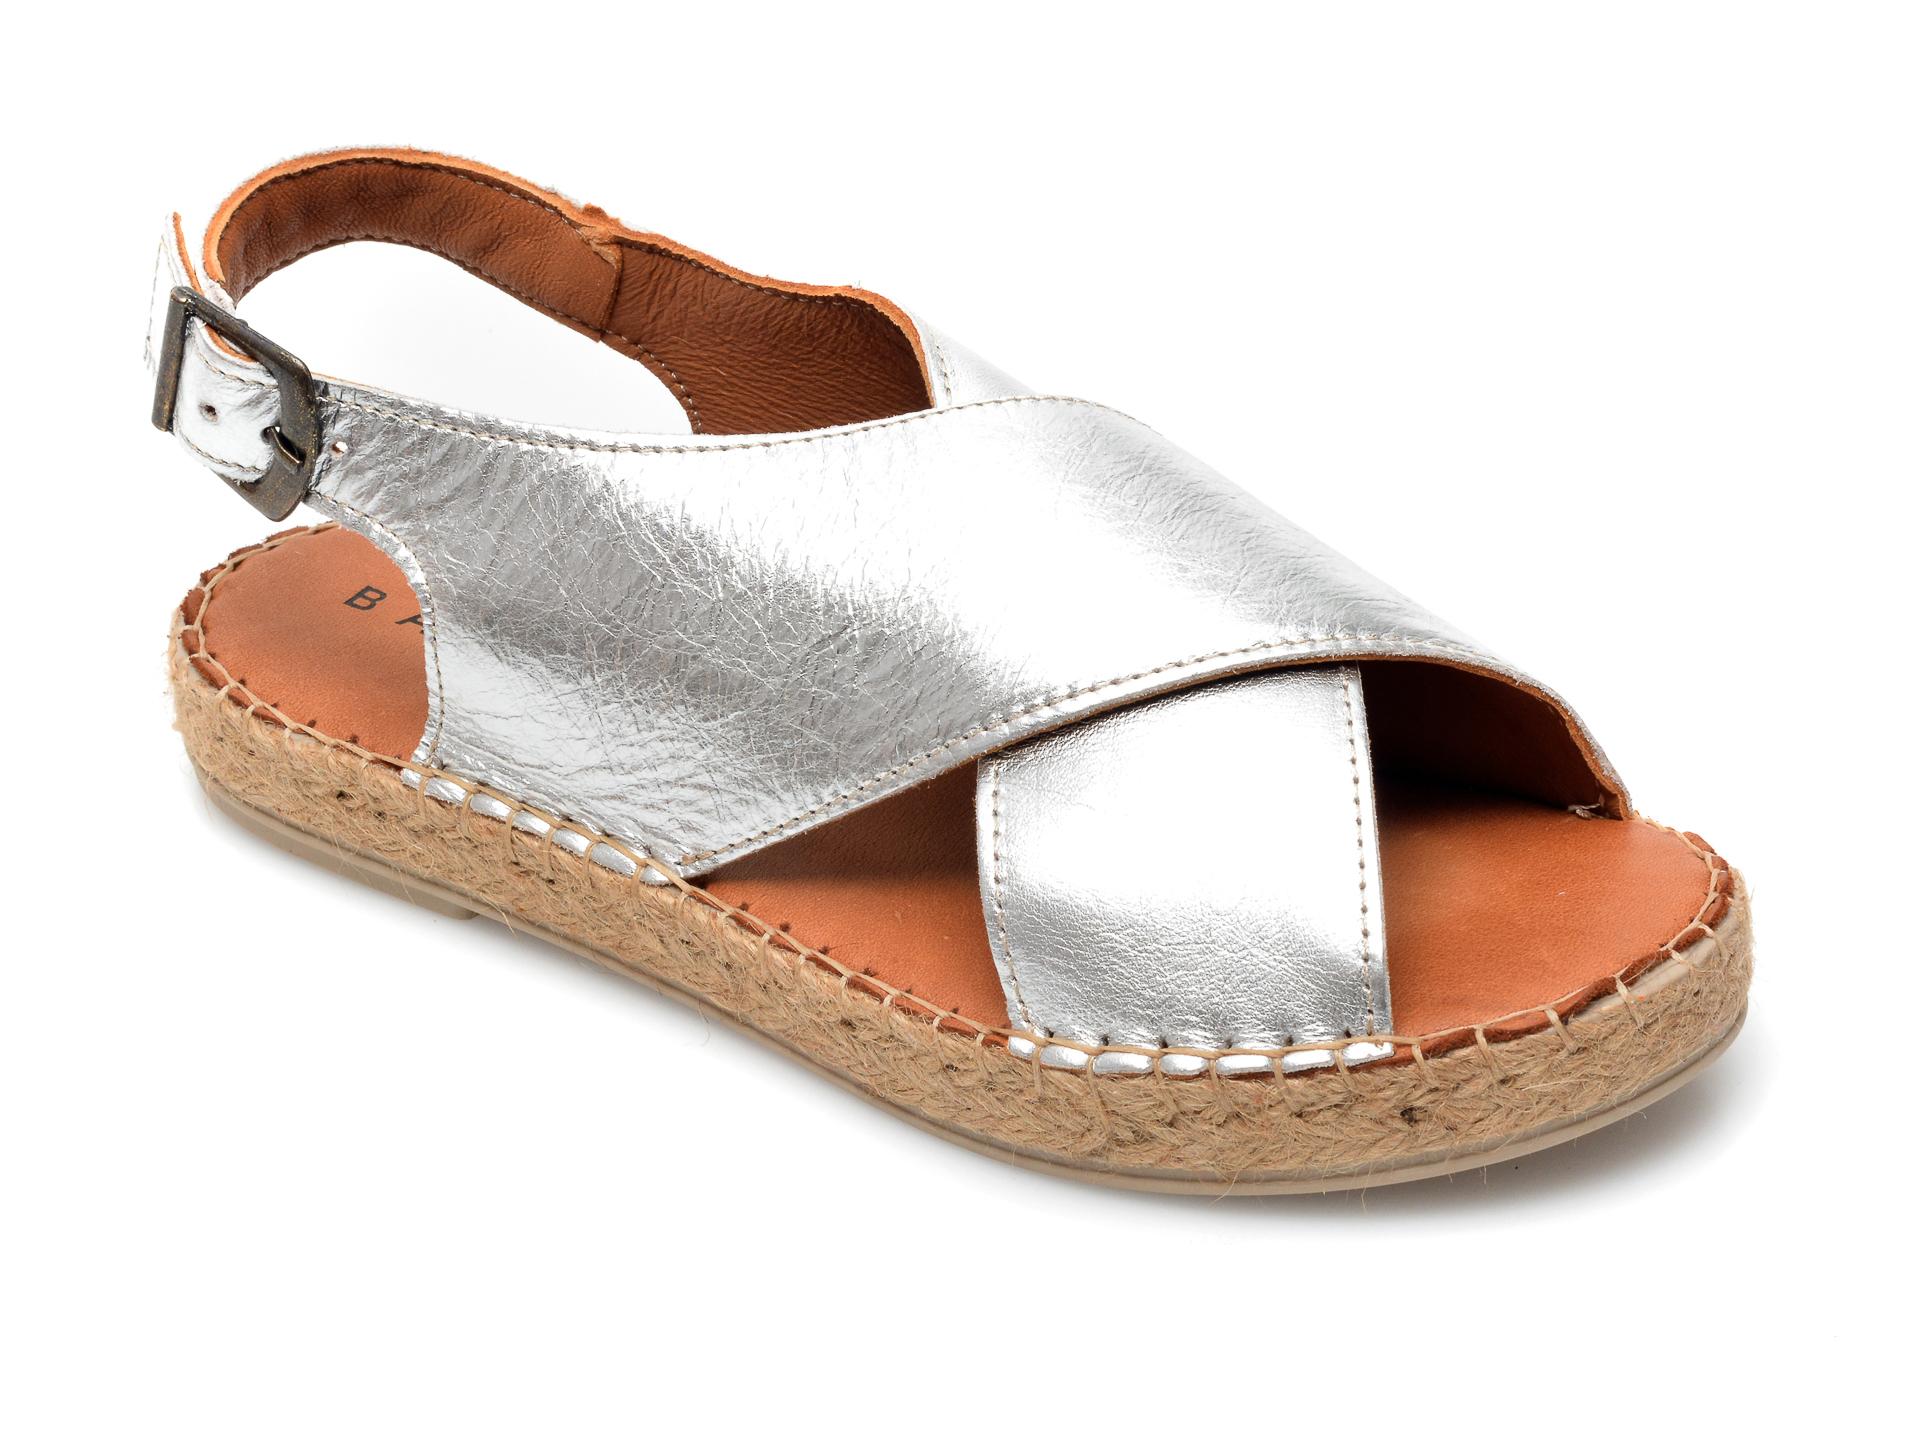 Sandale BABOOS argintii, R05, din piele naturala imagine otter.ro 2021